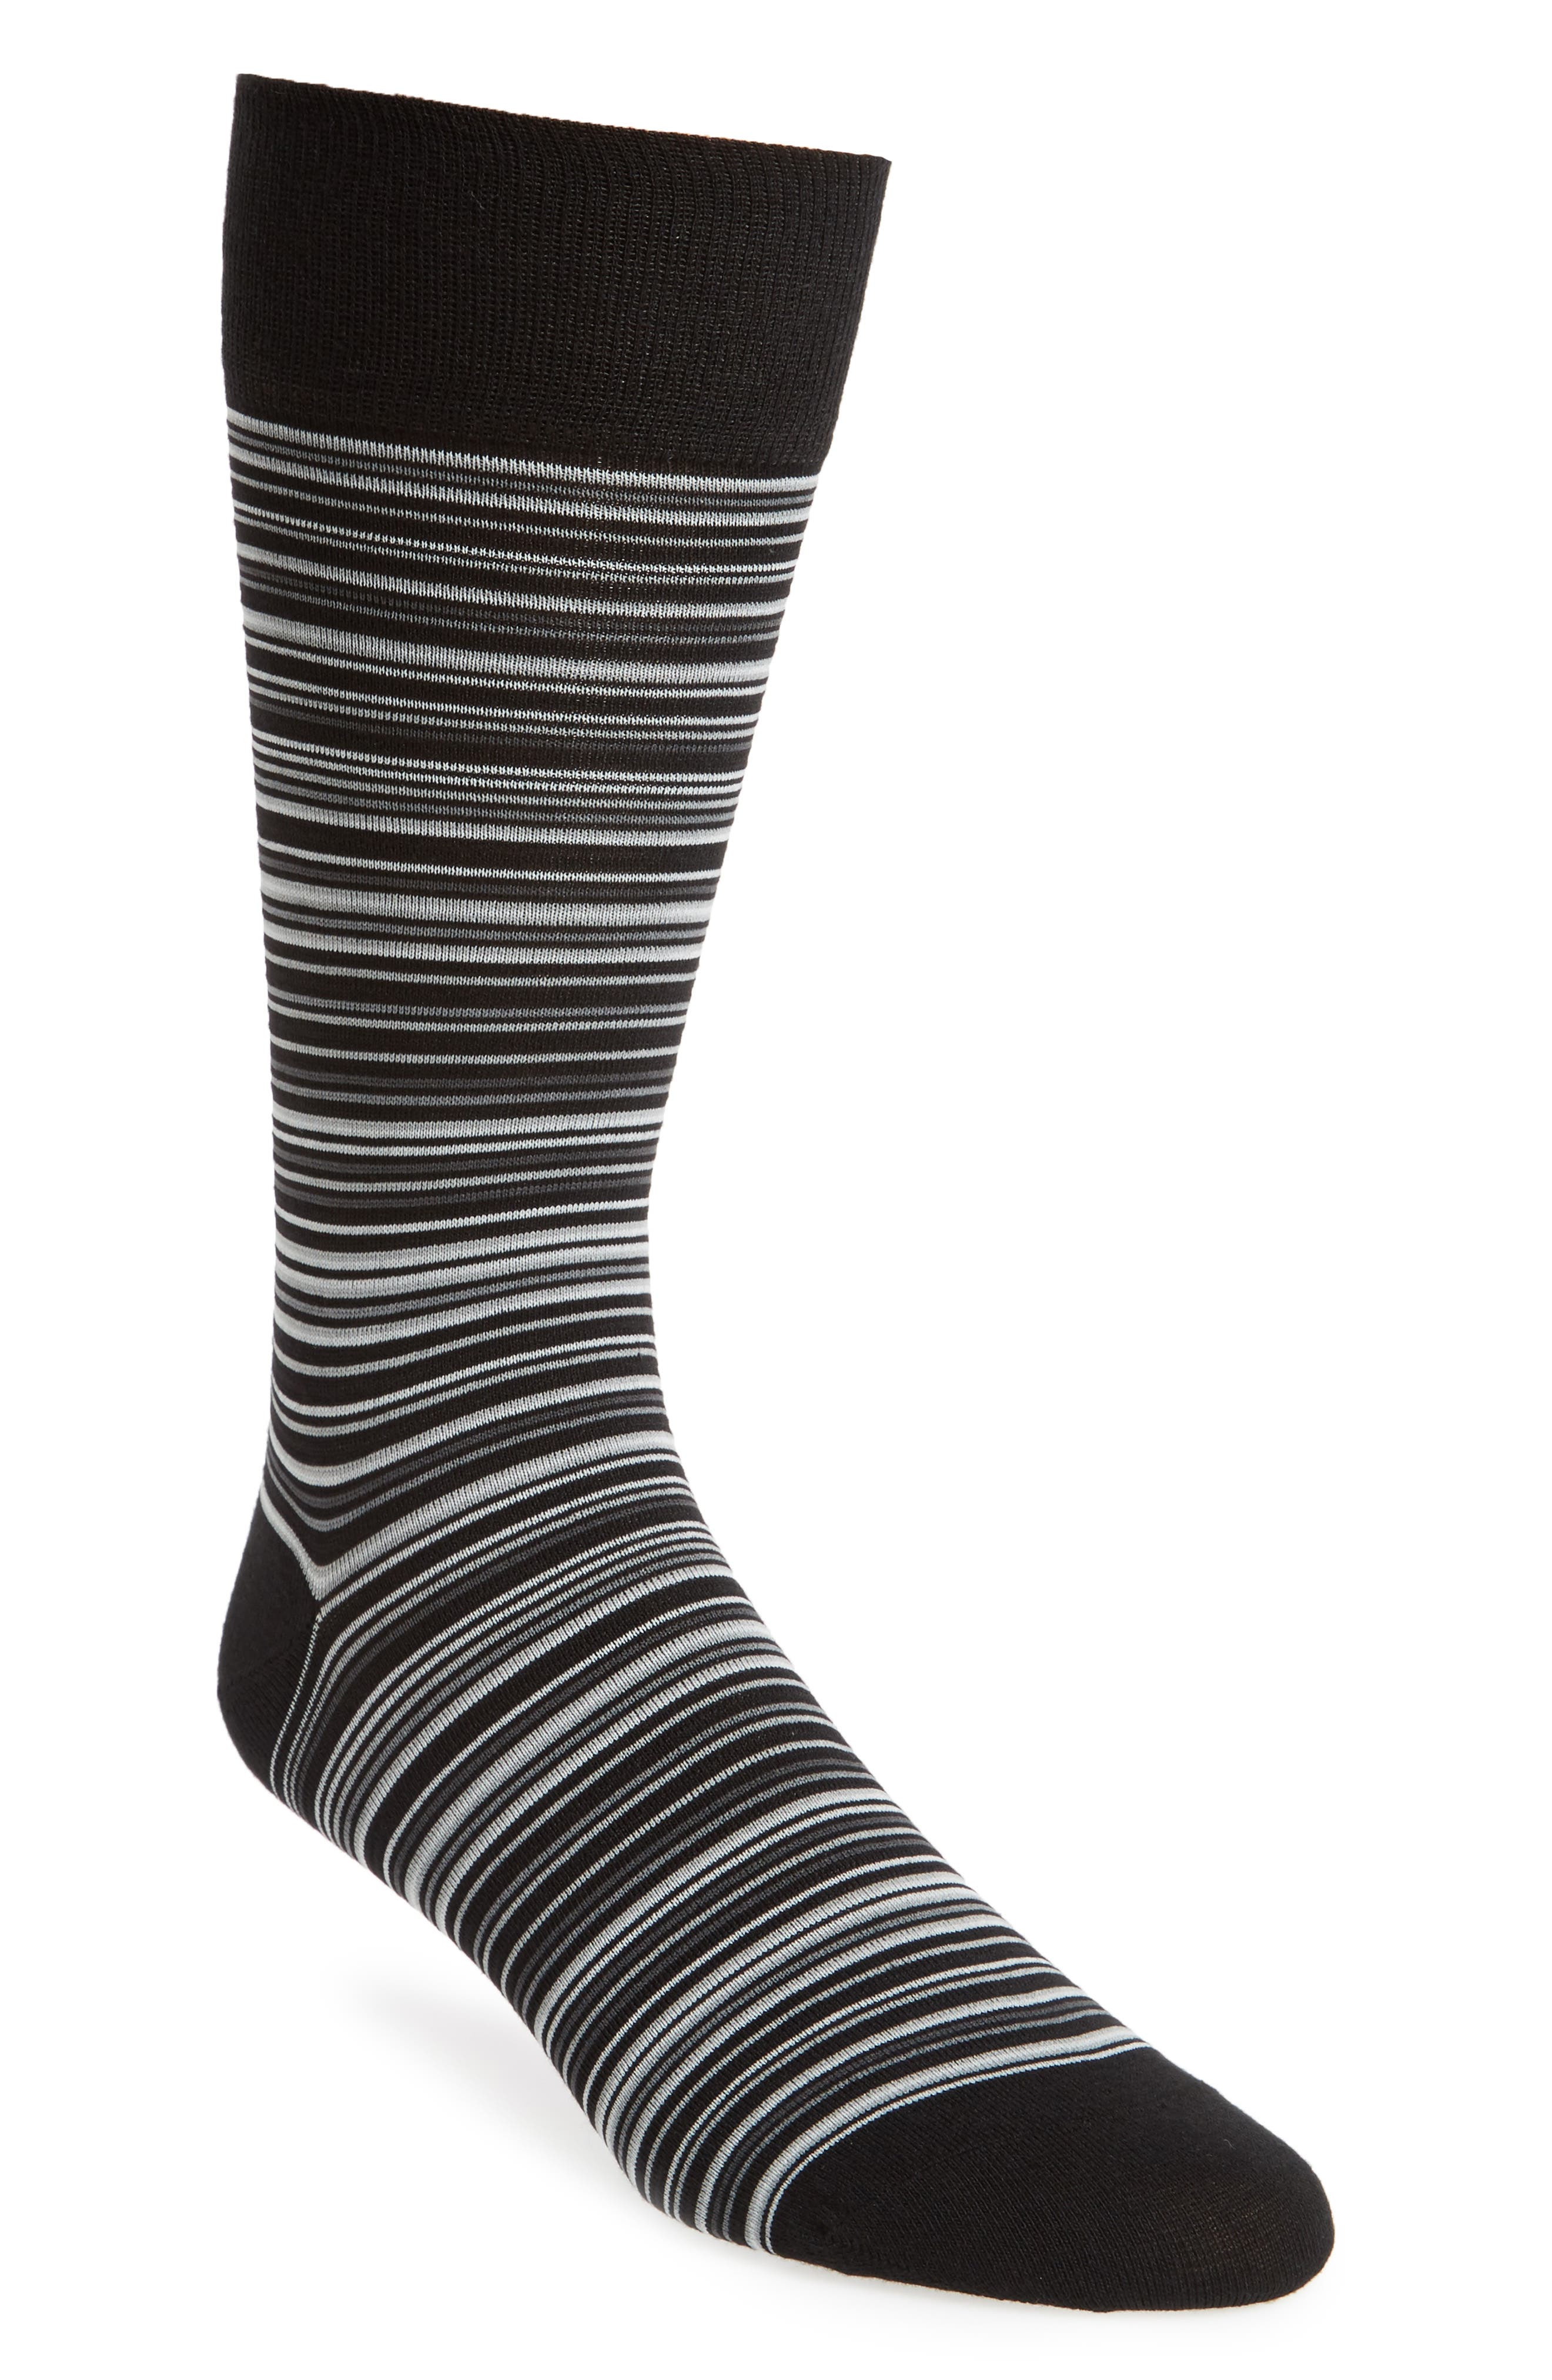 COLE HAAN Multistripe Crew Socks, Main, color, BLACK/ GREY